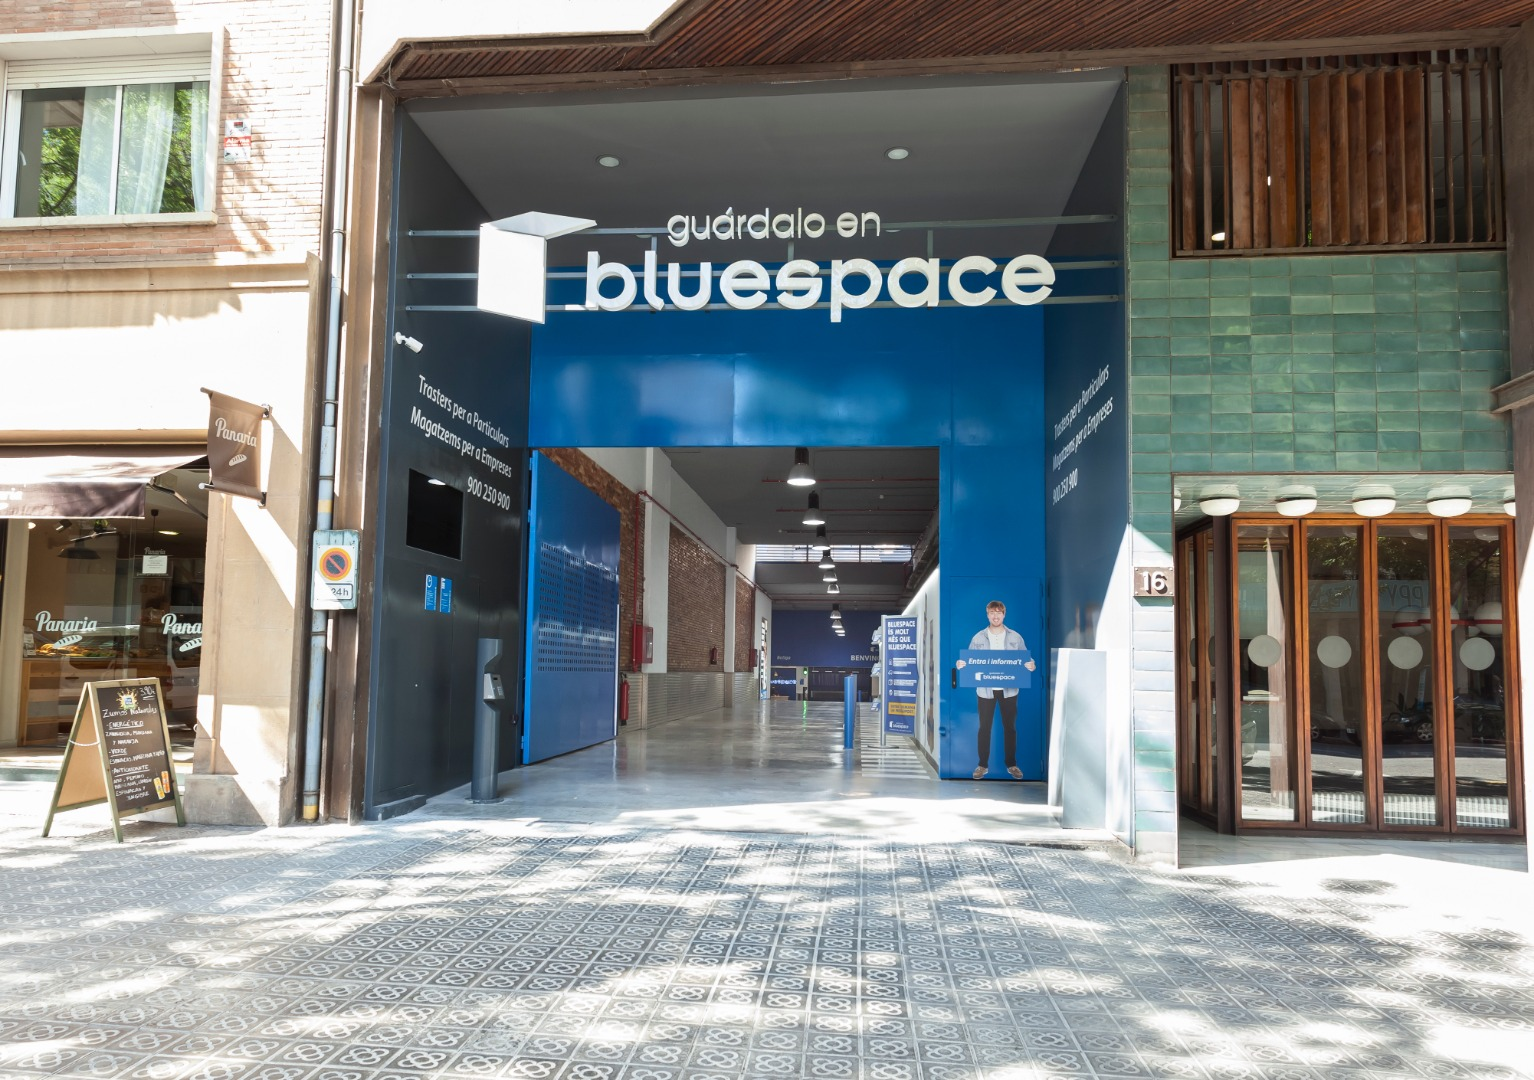 Location Entrepôt  Calle bori i fontestà, 16. Trasteros bluespace, de 2 m2 zona granduxer (barcelona) ¡reserv